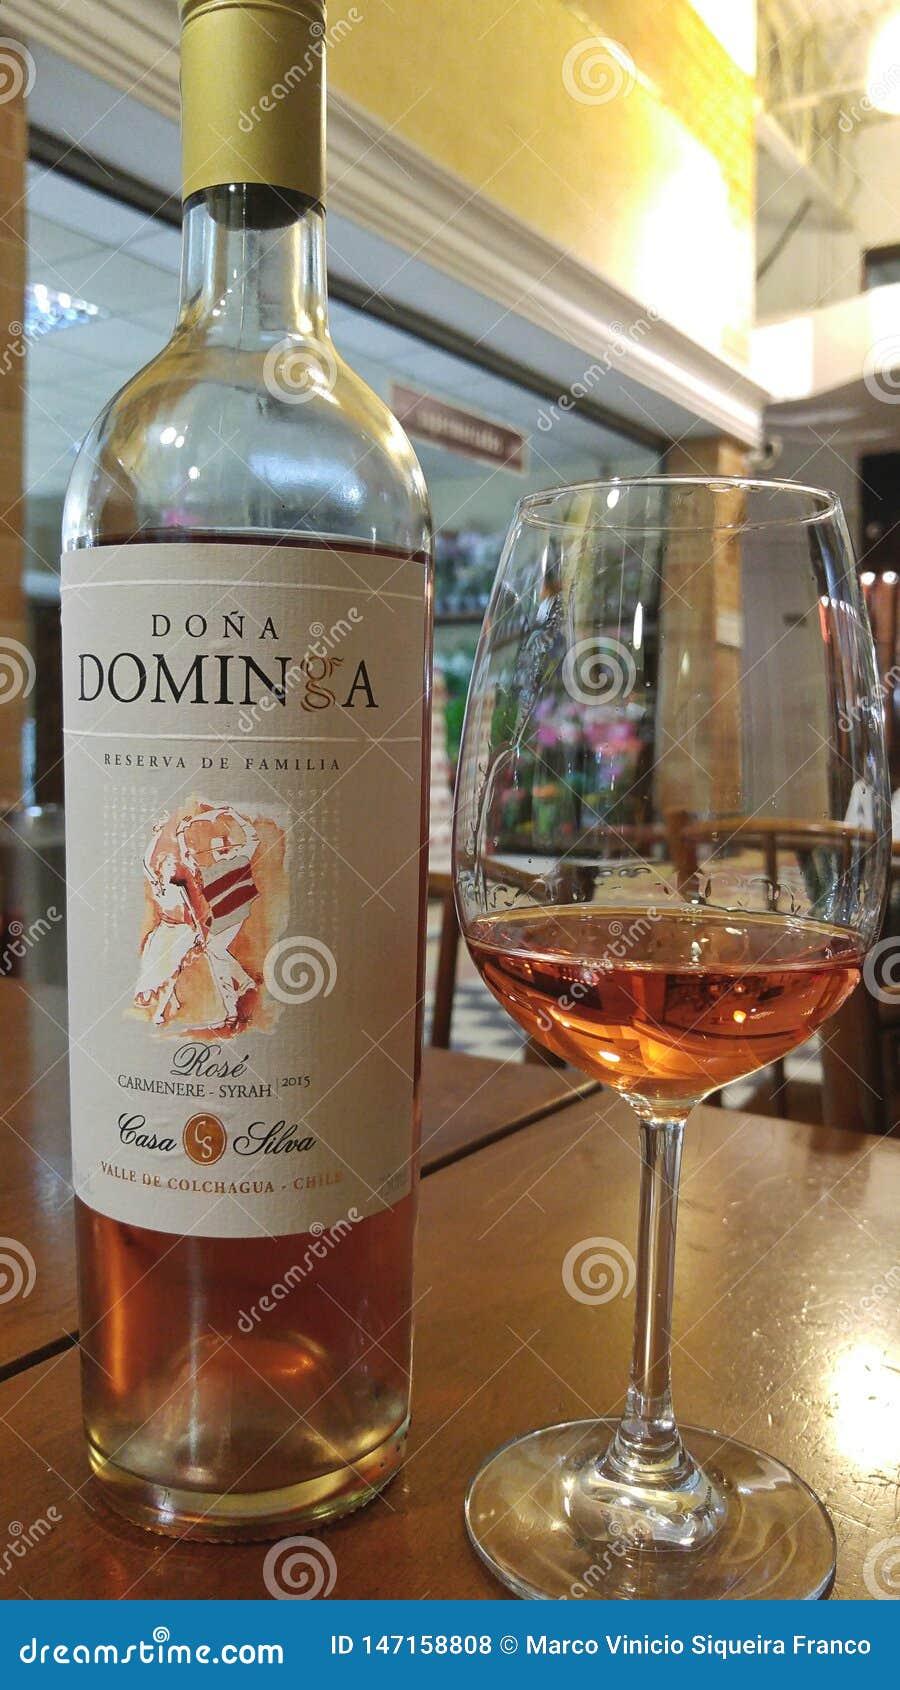 Cileno Rose Wine